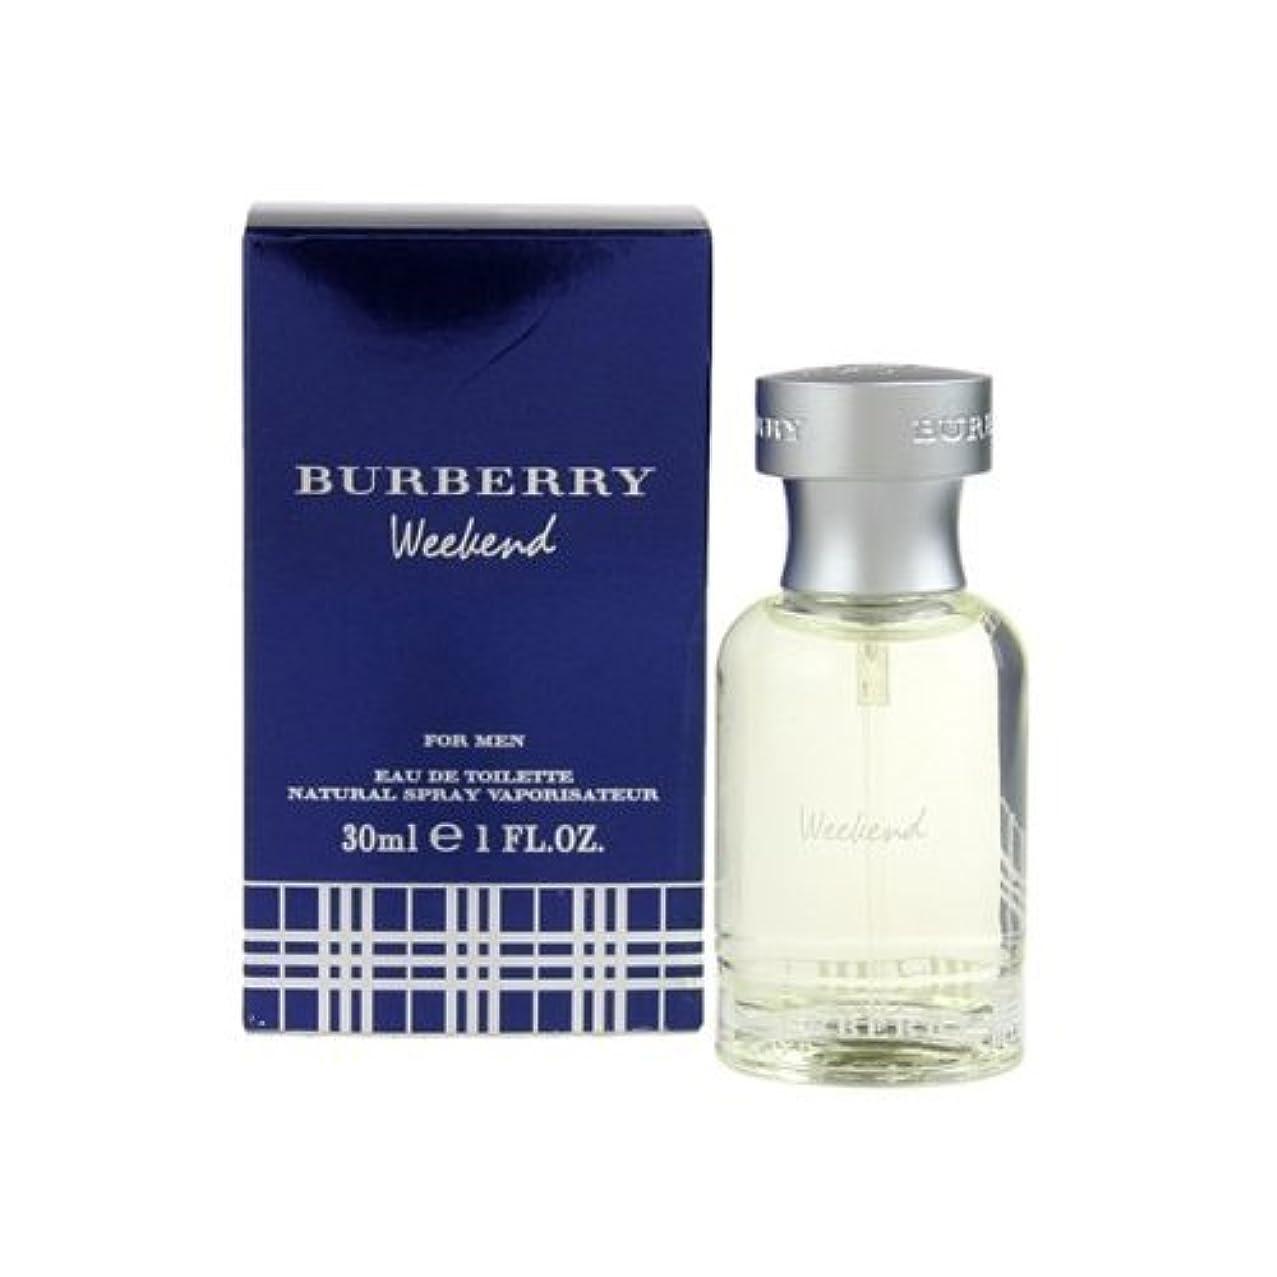 BURBERRY バーバリー ウィークエンドフォーM EDT 30ML